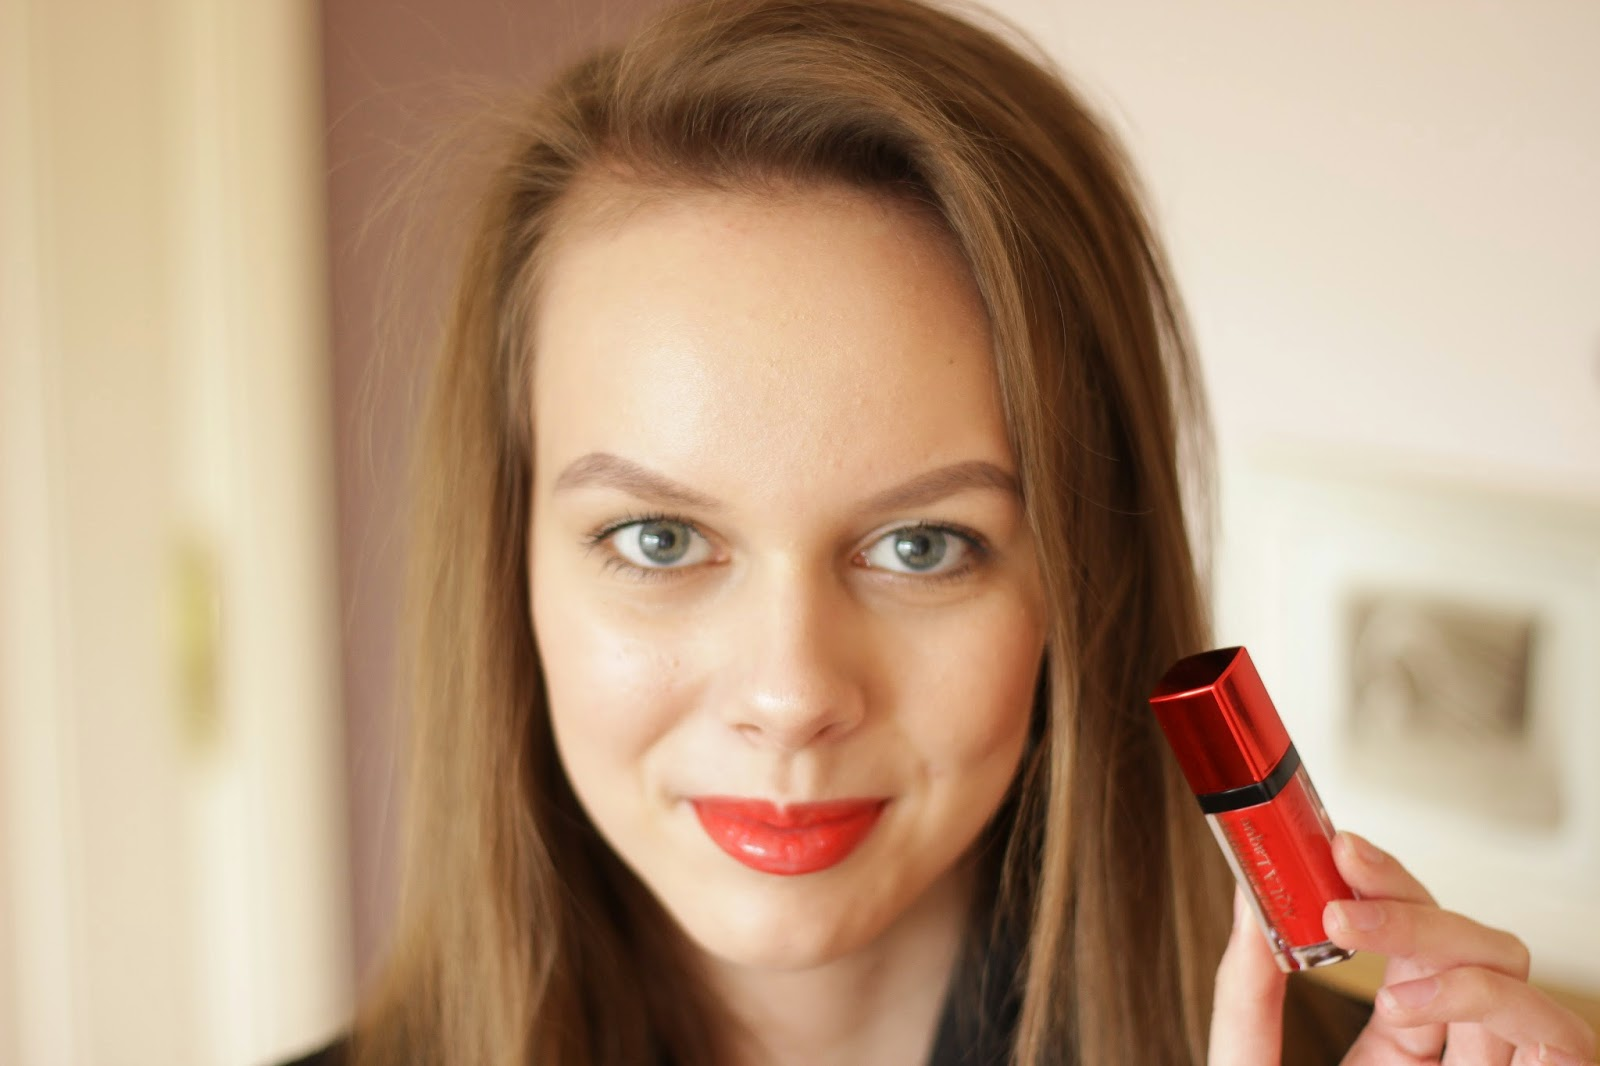 bourjois rouge edition aqua laque review swatches